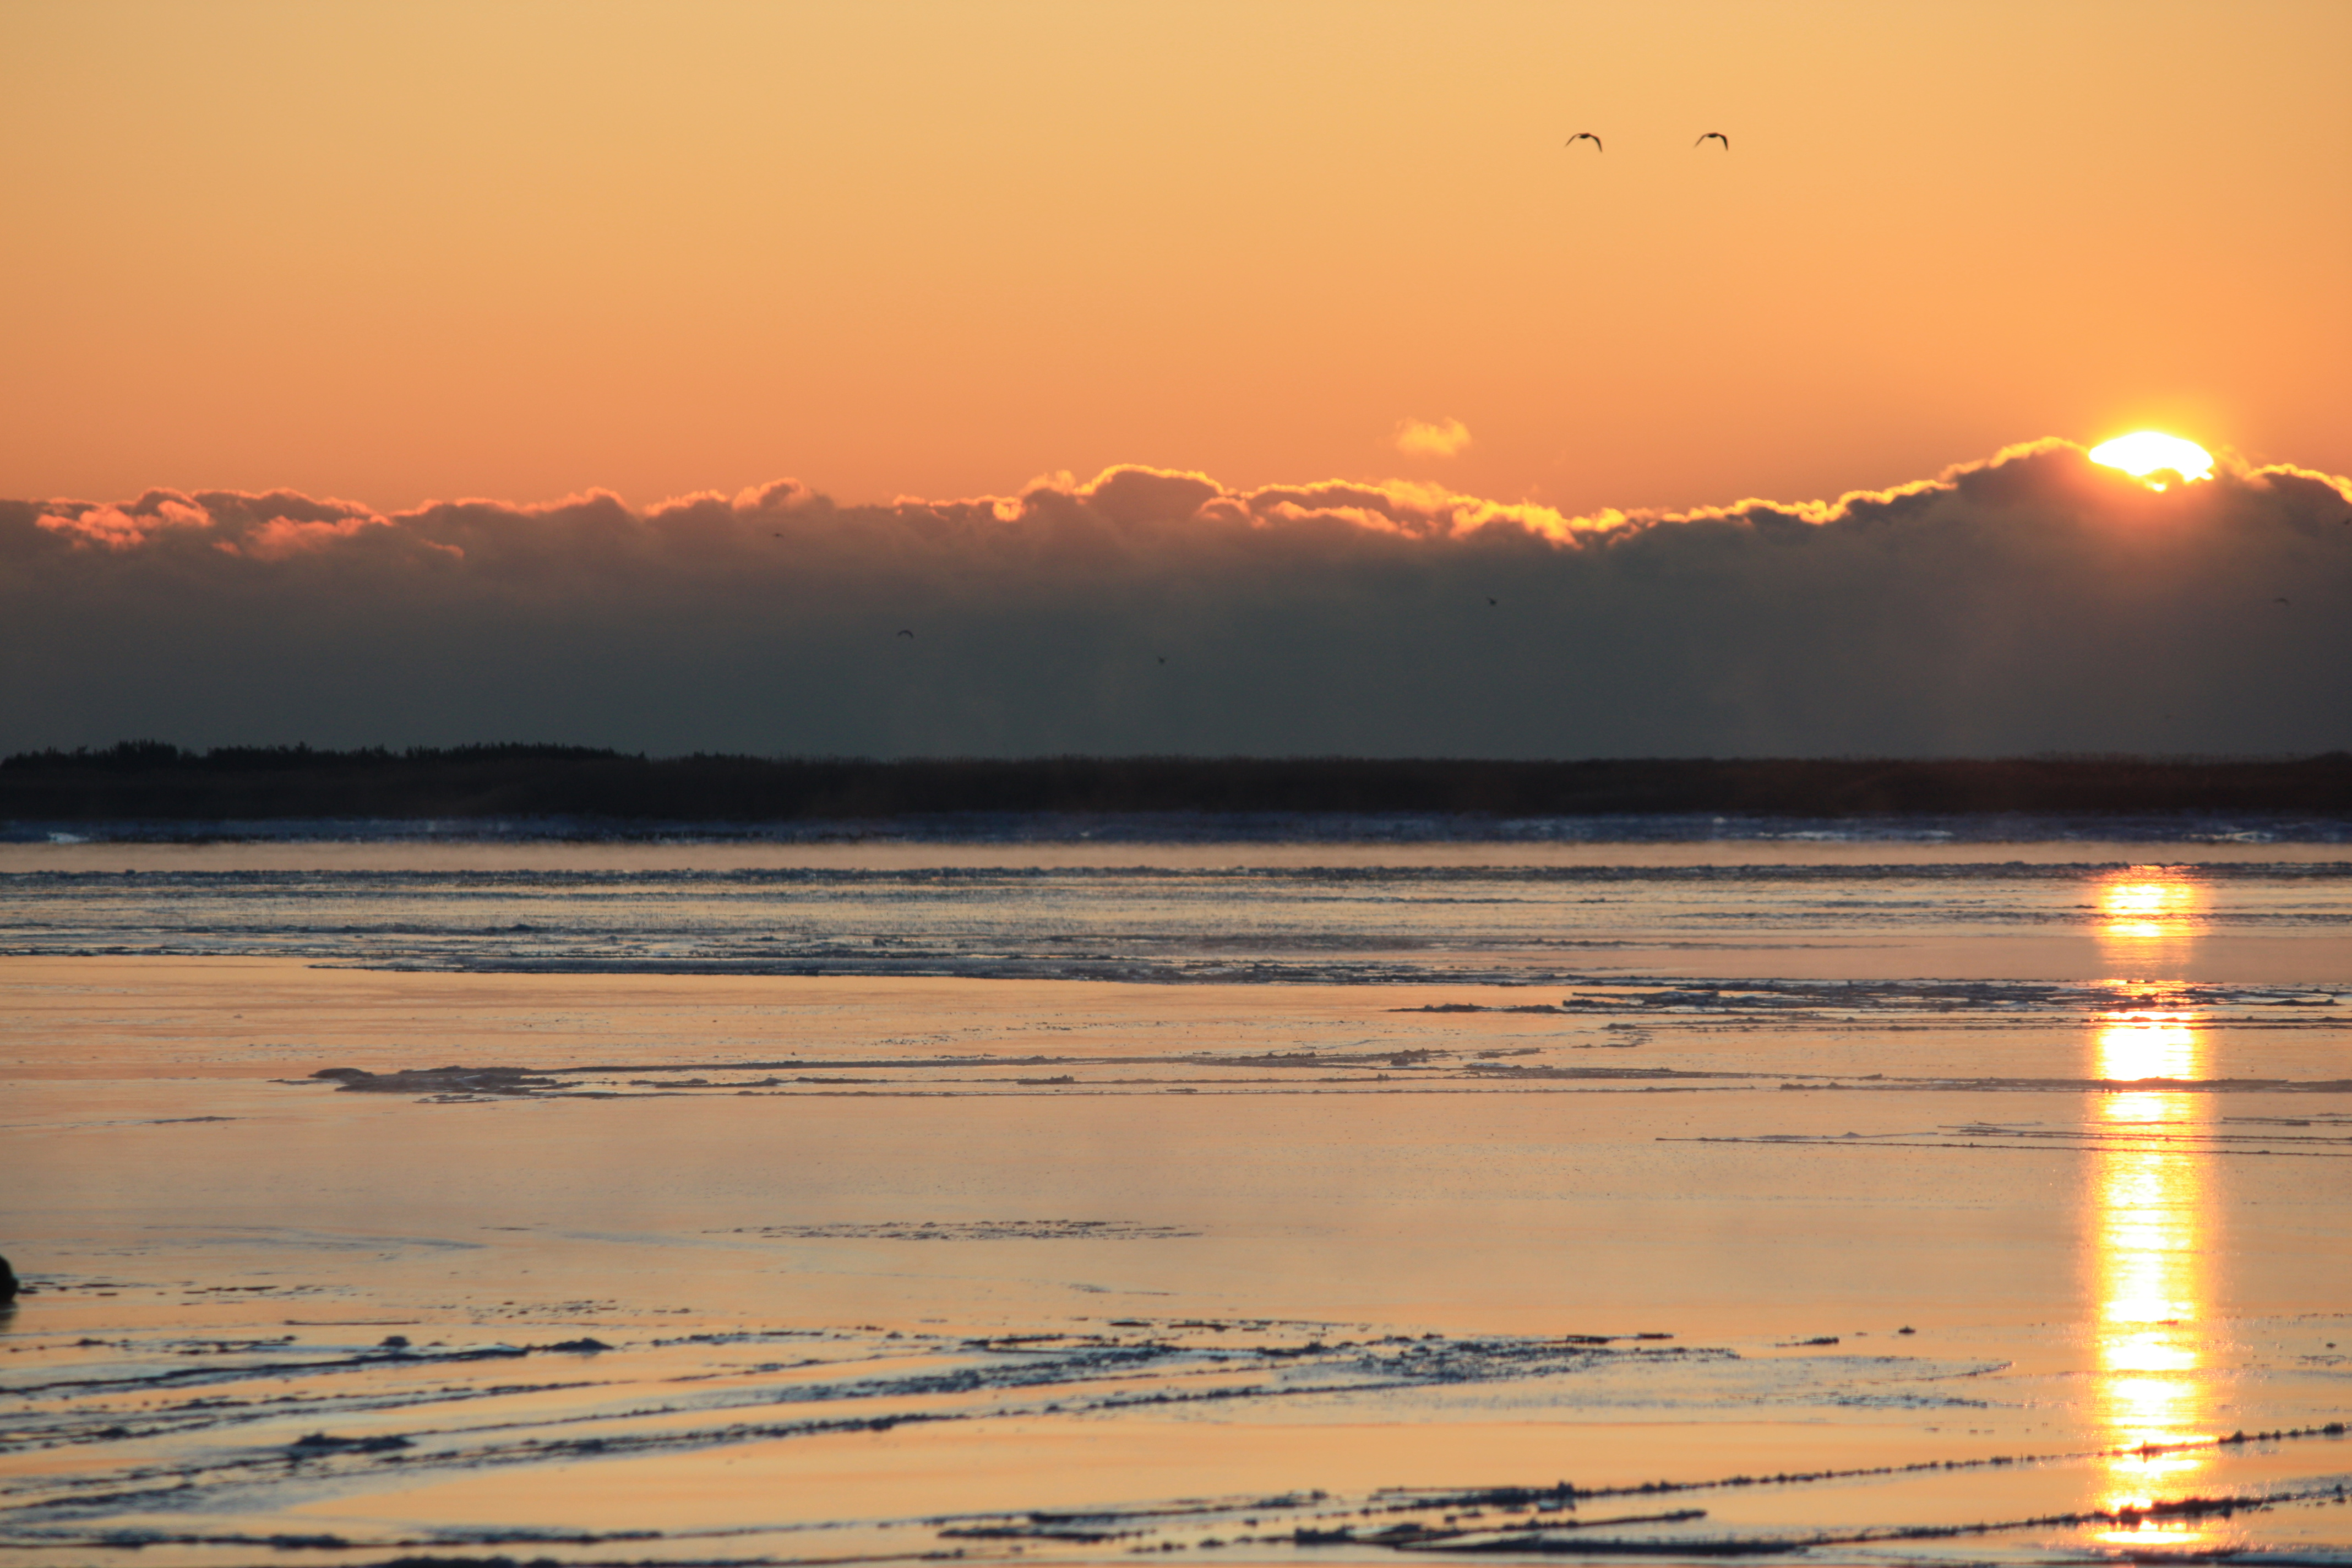 Cold Sunrise by ingui